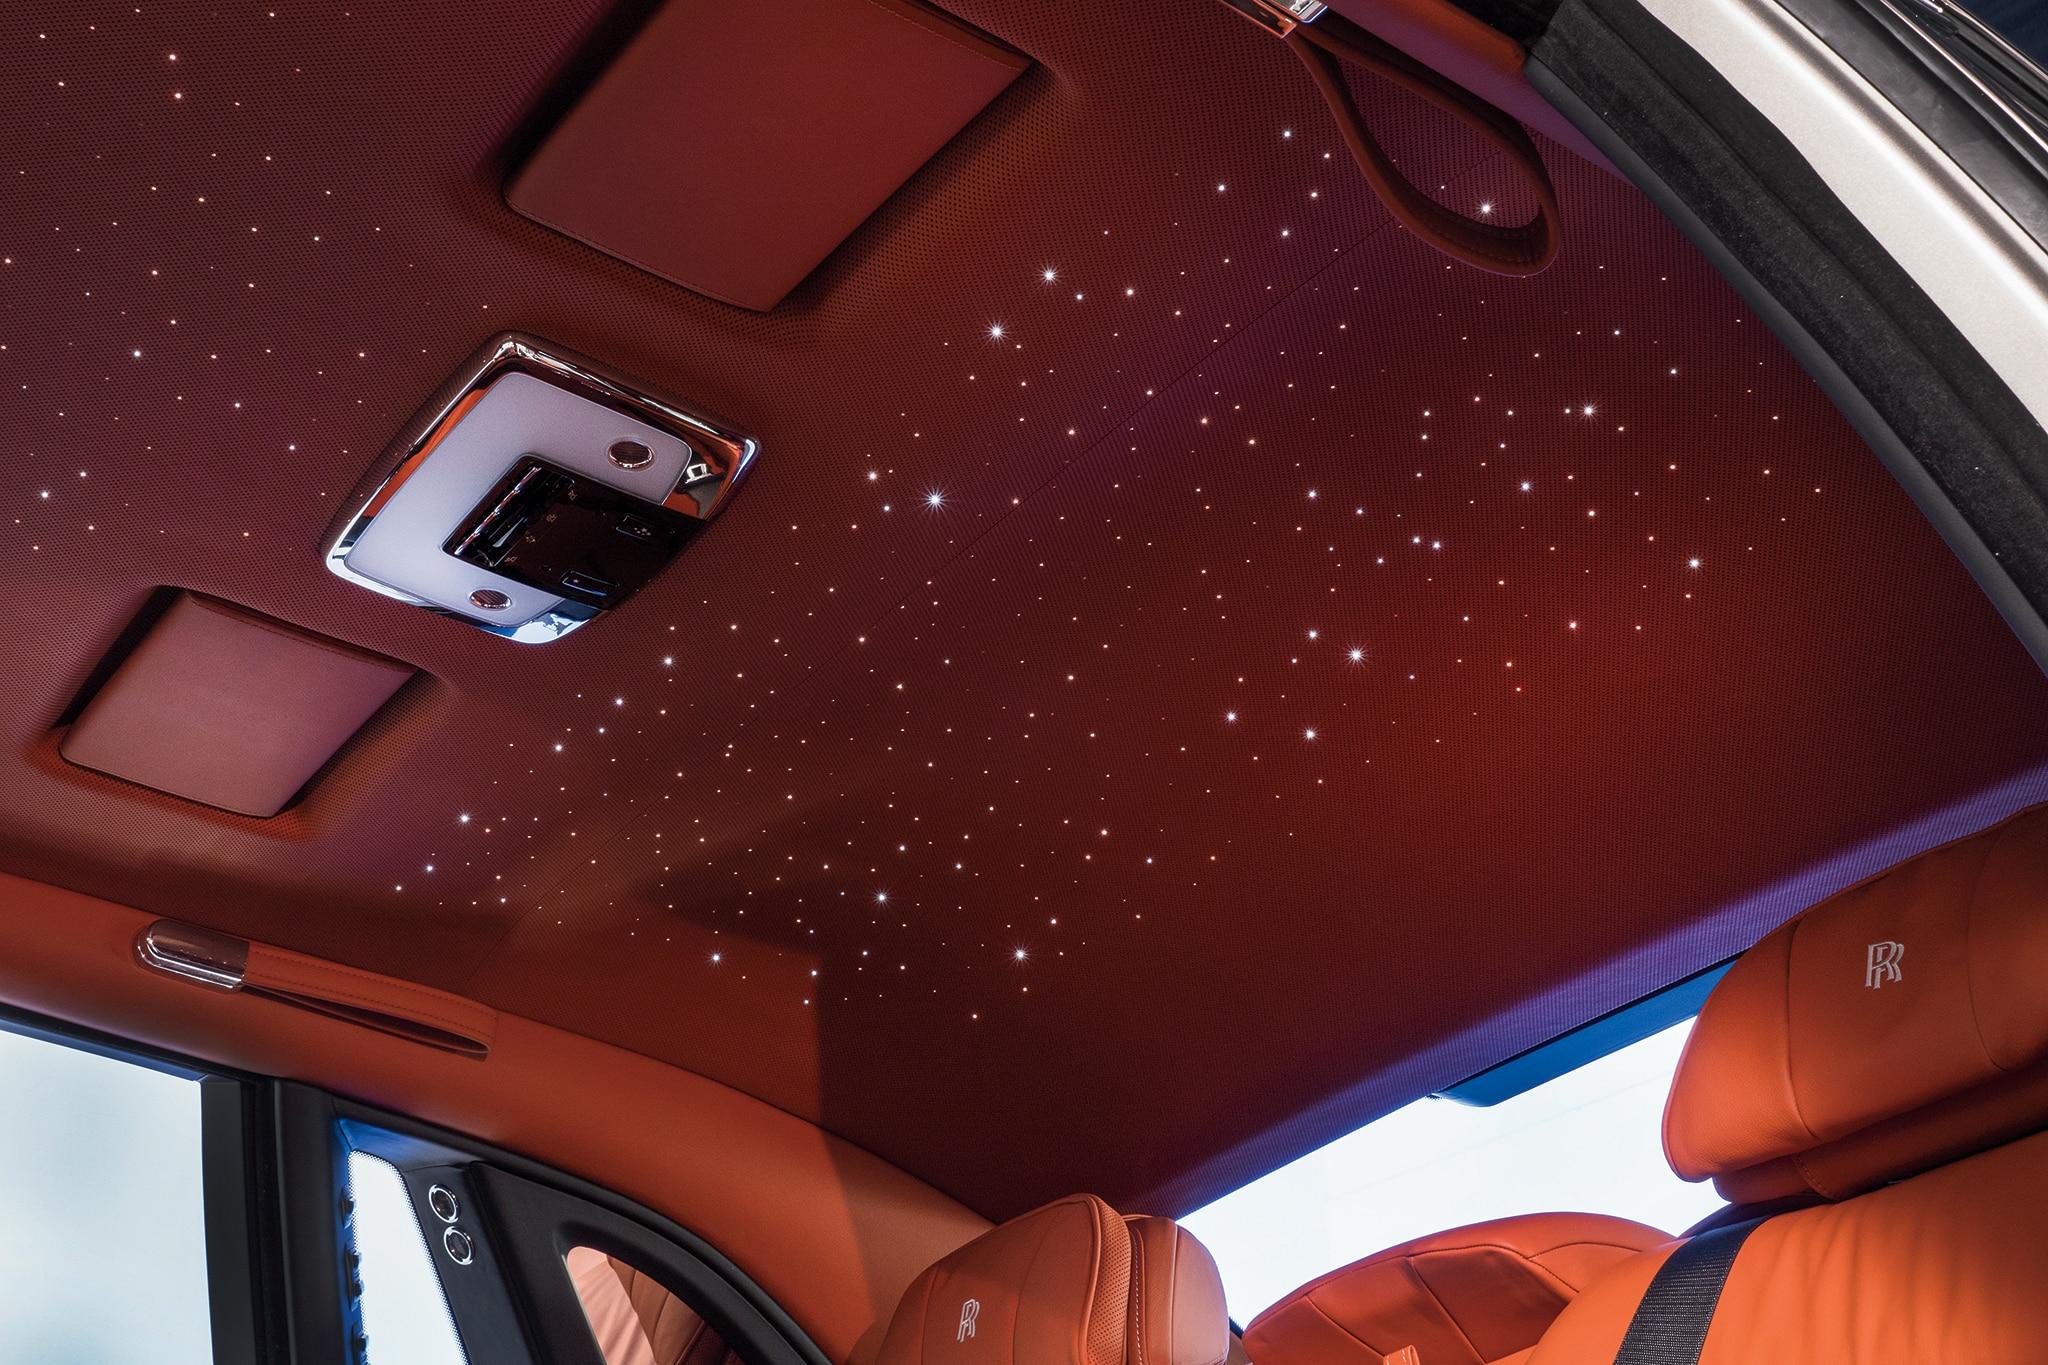 Rolls Royce Phantom 2018 Top View >> By Design: Rolls-Royce Phantom VIII | Automobile Magazine